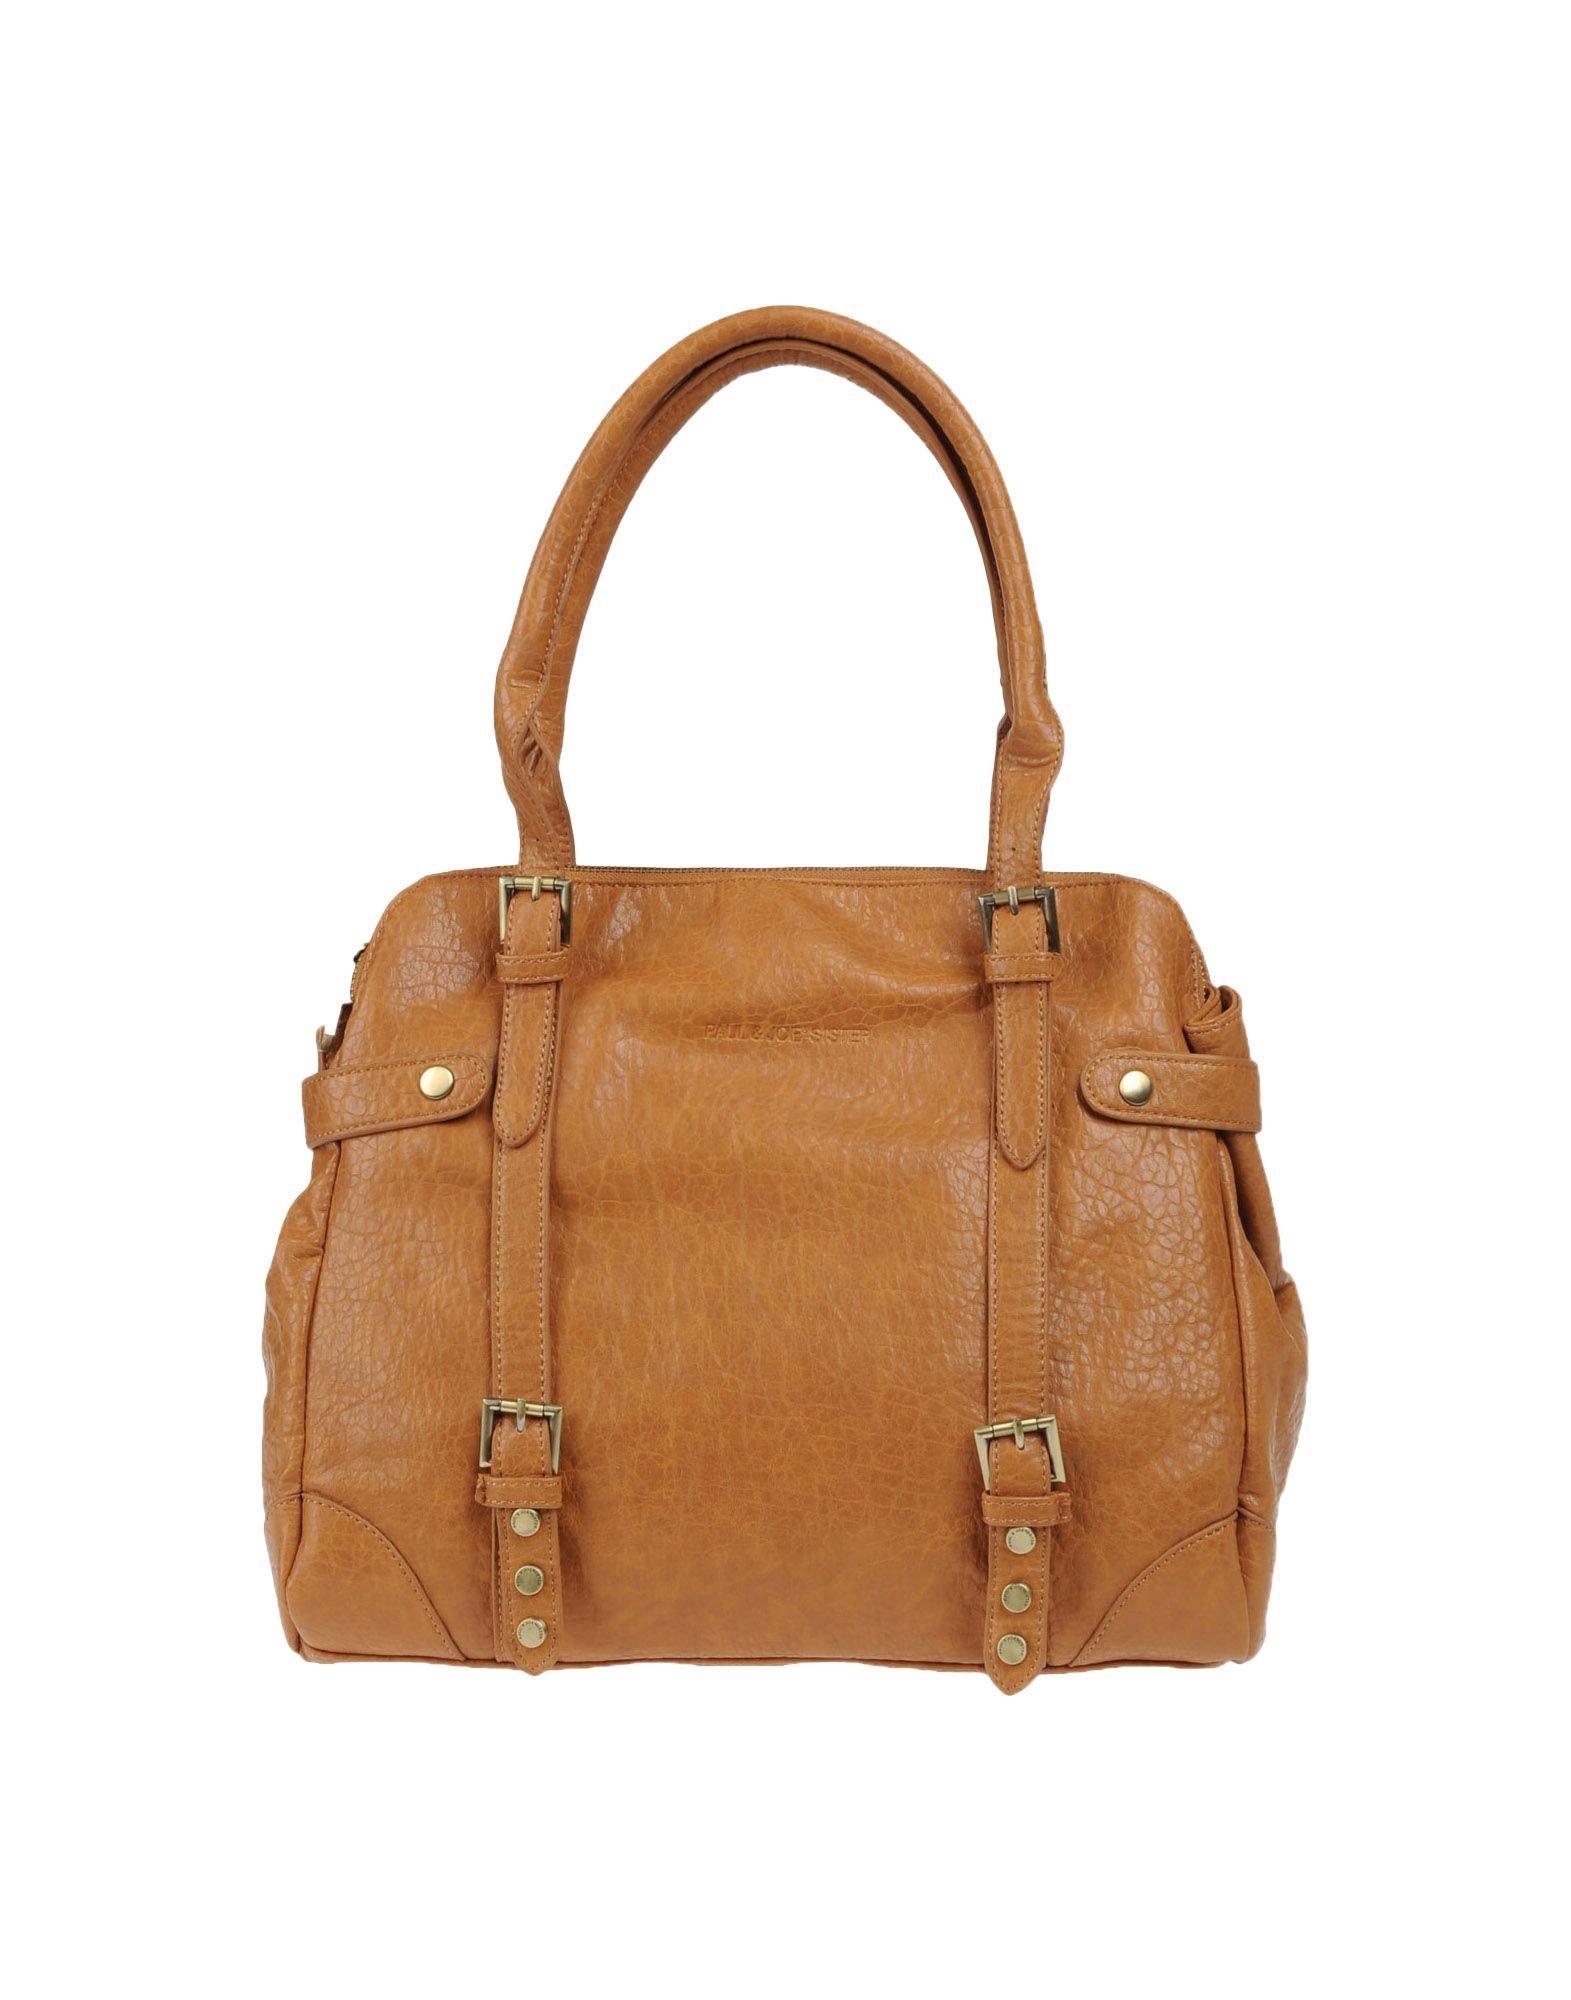 Paul and Joe Sister Leather Bags